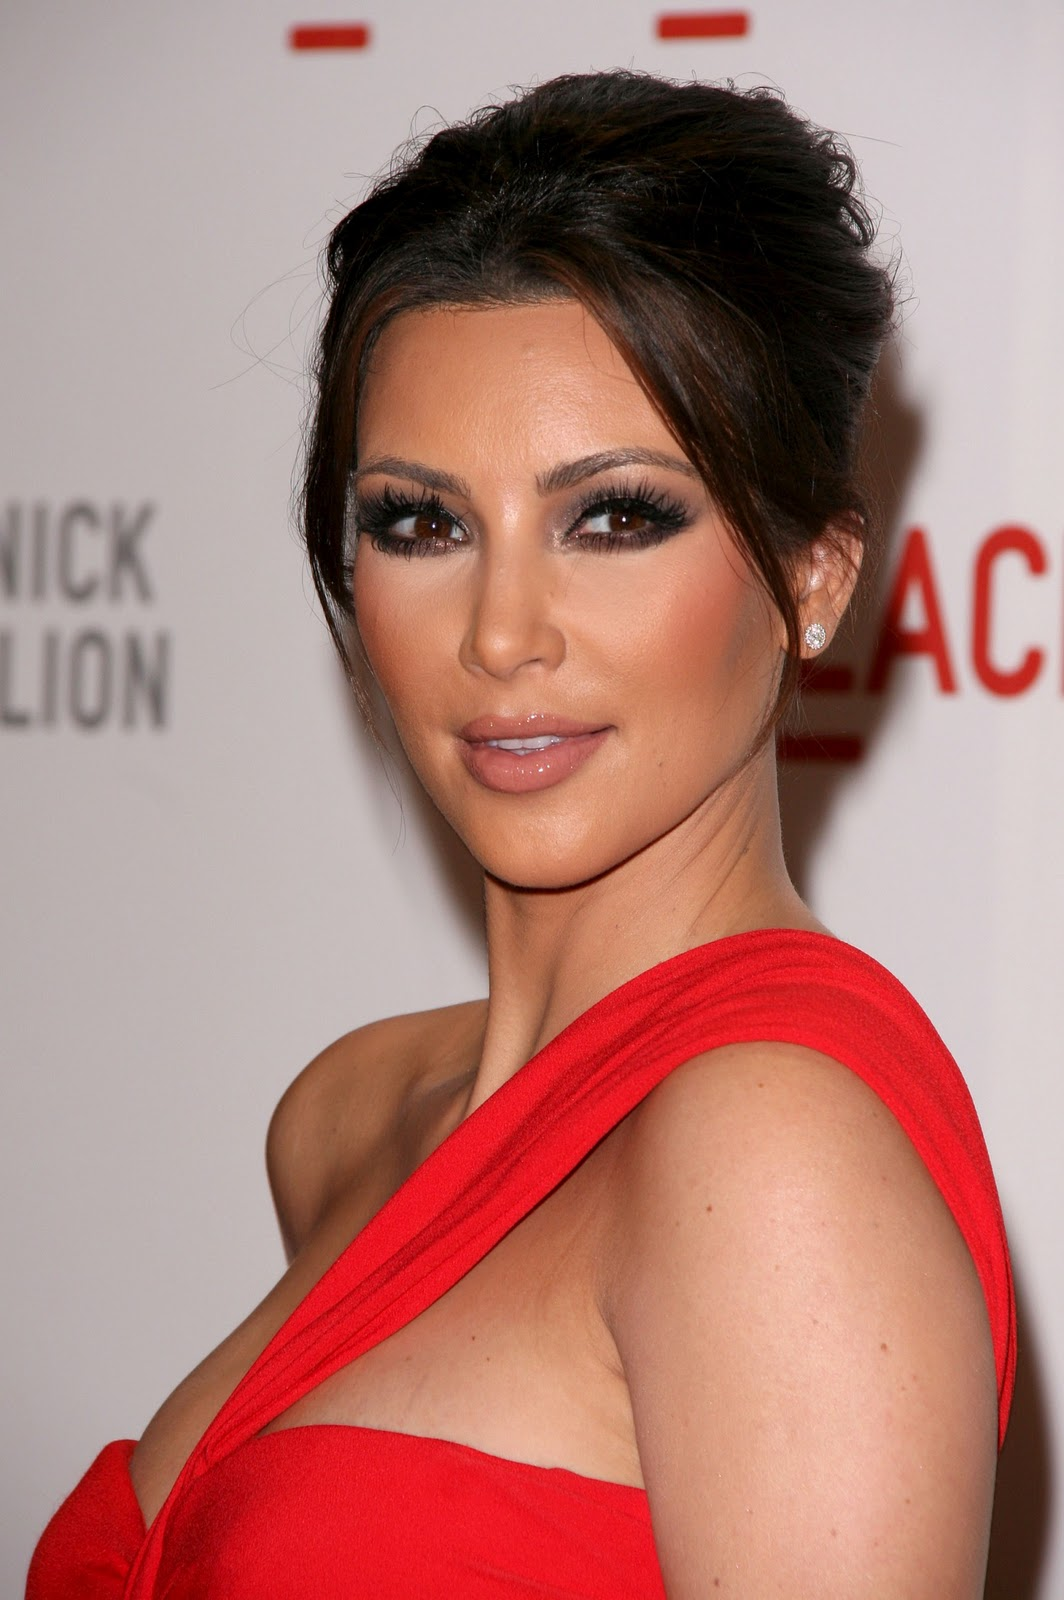 Y Durrani: Kim Kardashian The Sizzling Red Beauty